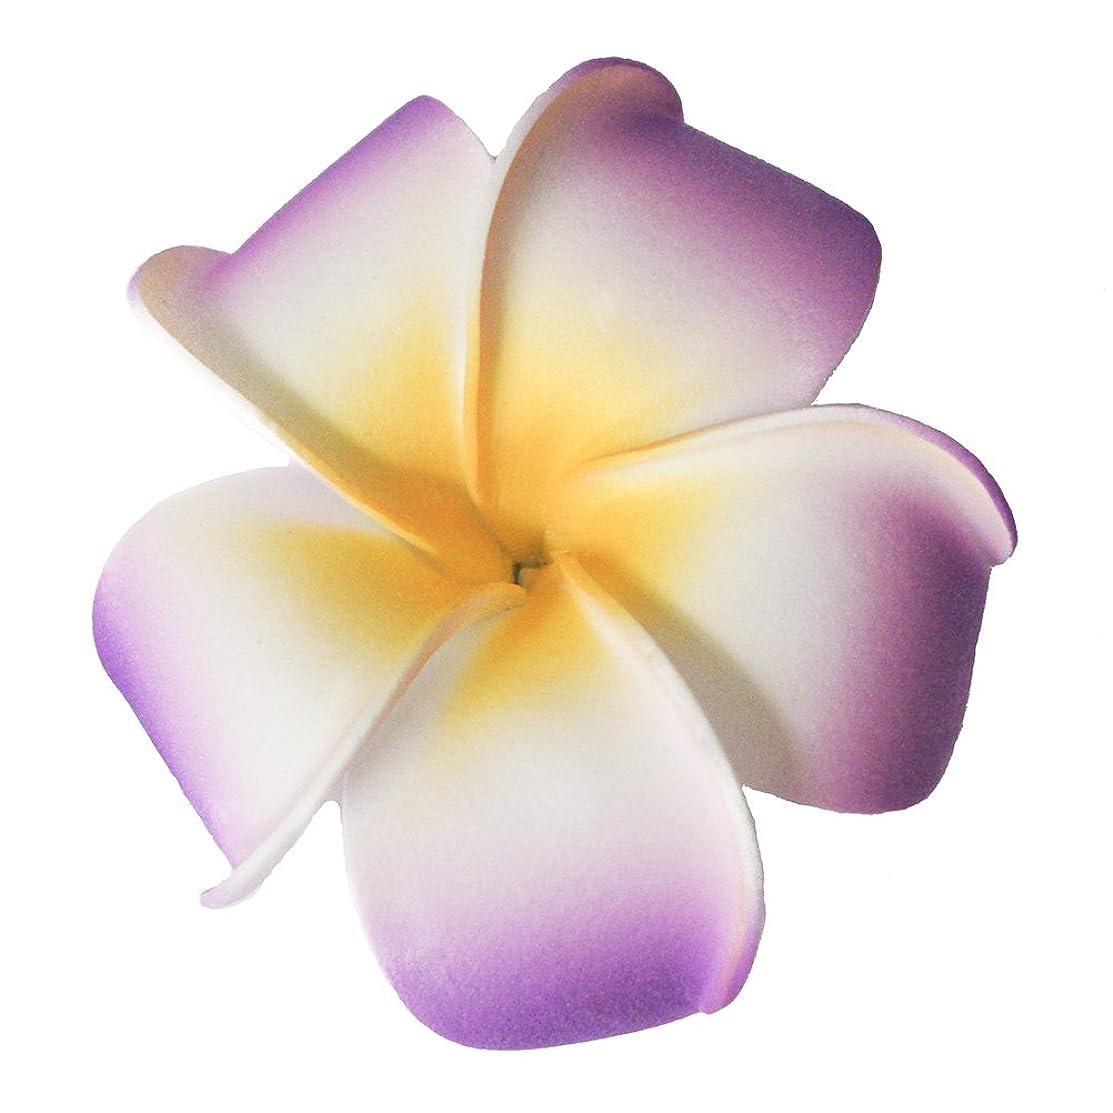 ROSENICE Hawaiian Plumeria Flower Headpiece Hairpin Barrette Hair Clip Accessory